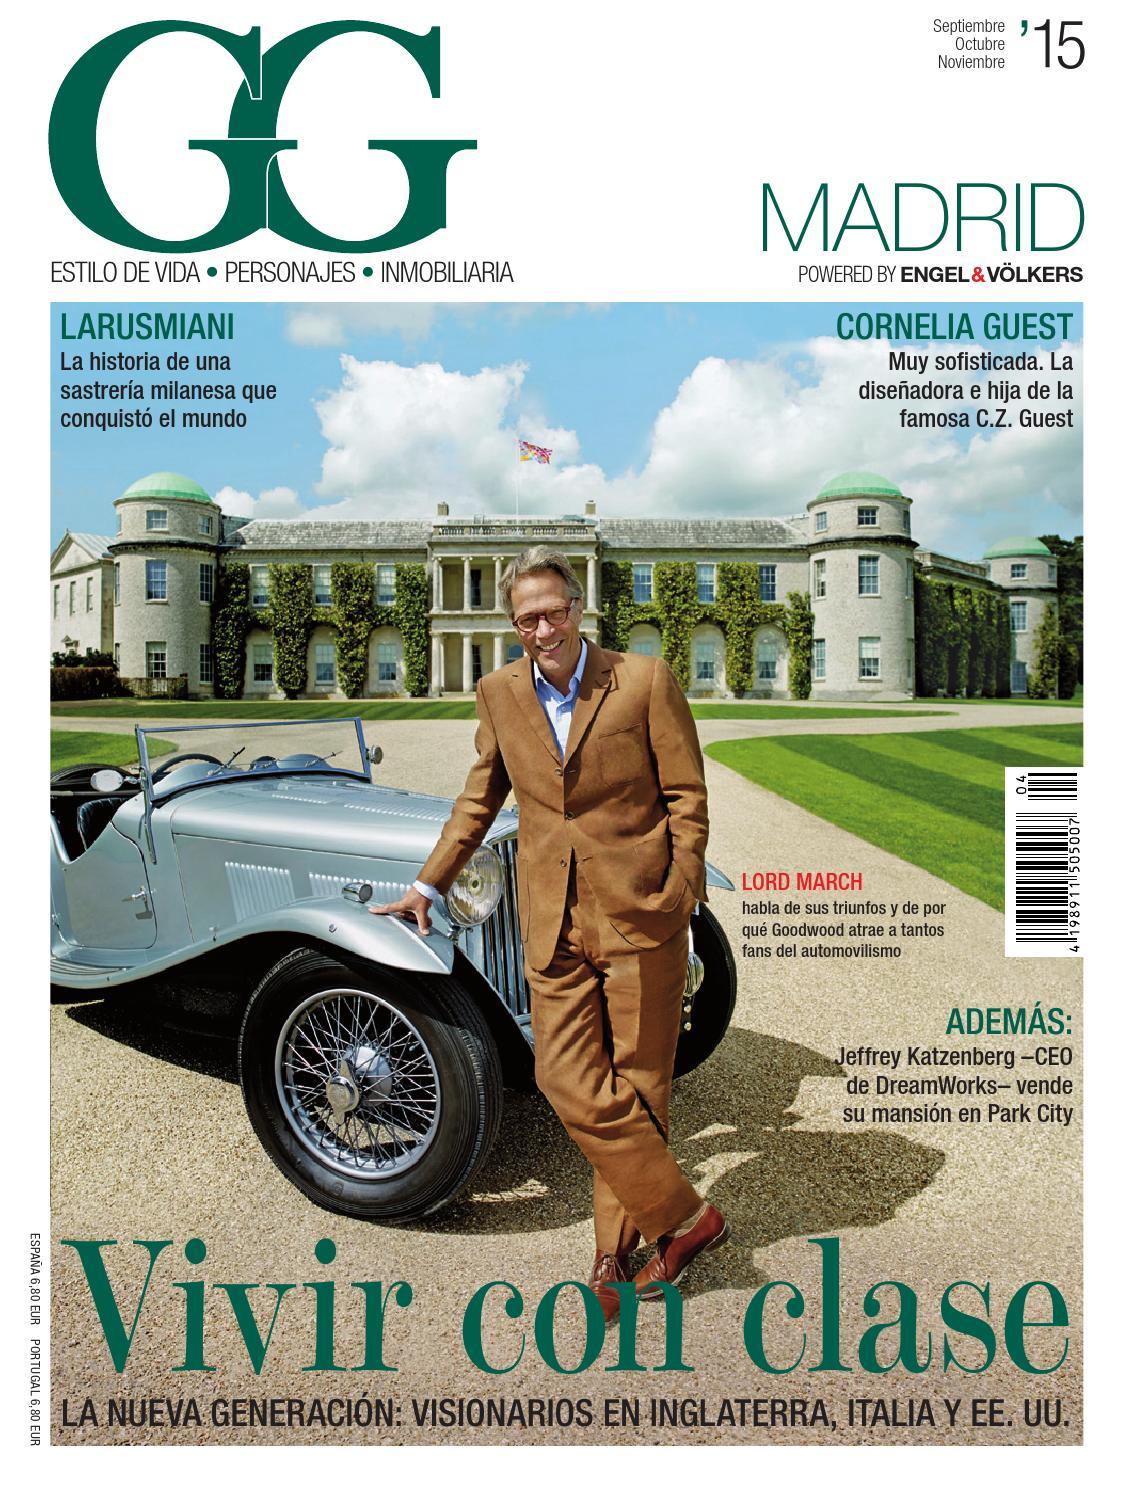 GG Magazine 04 2015 Madrid by GG-Magazine - issuu 642055ed5d9